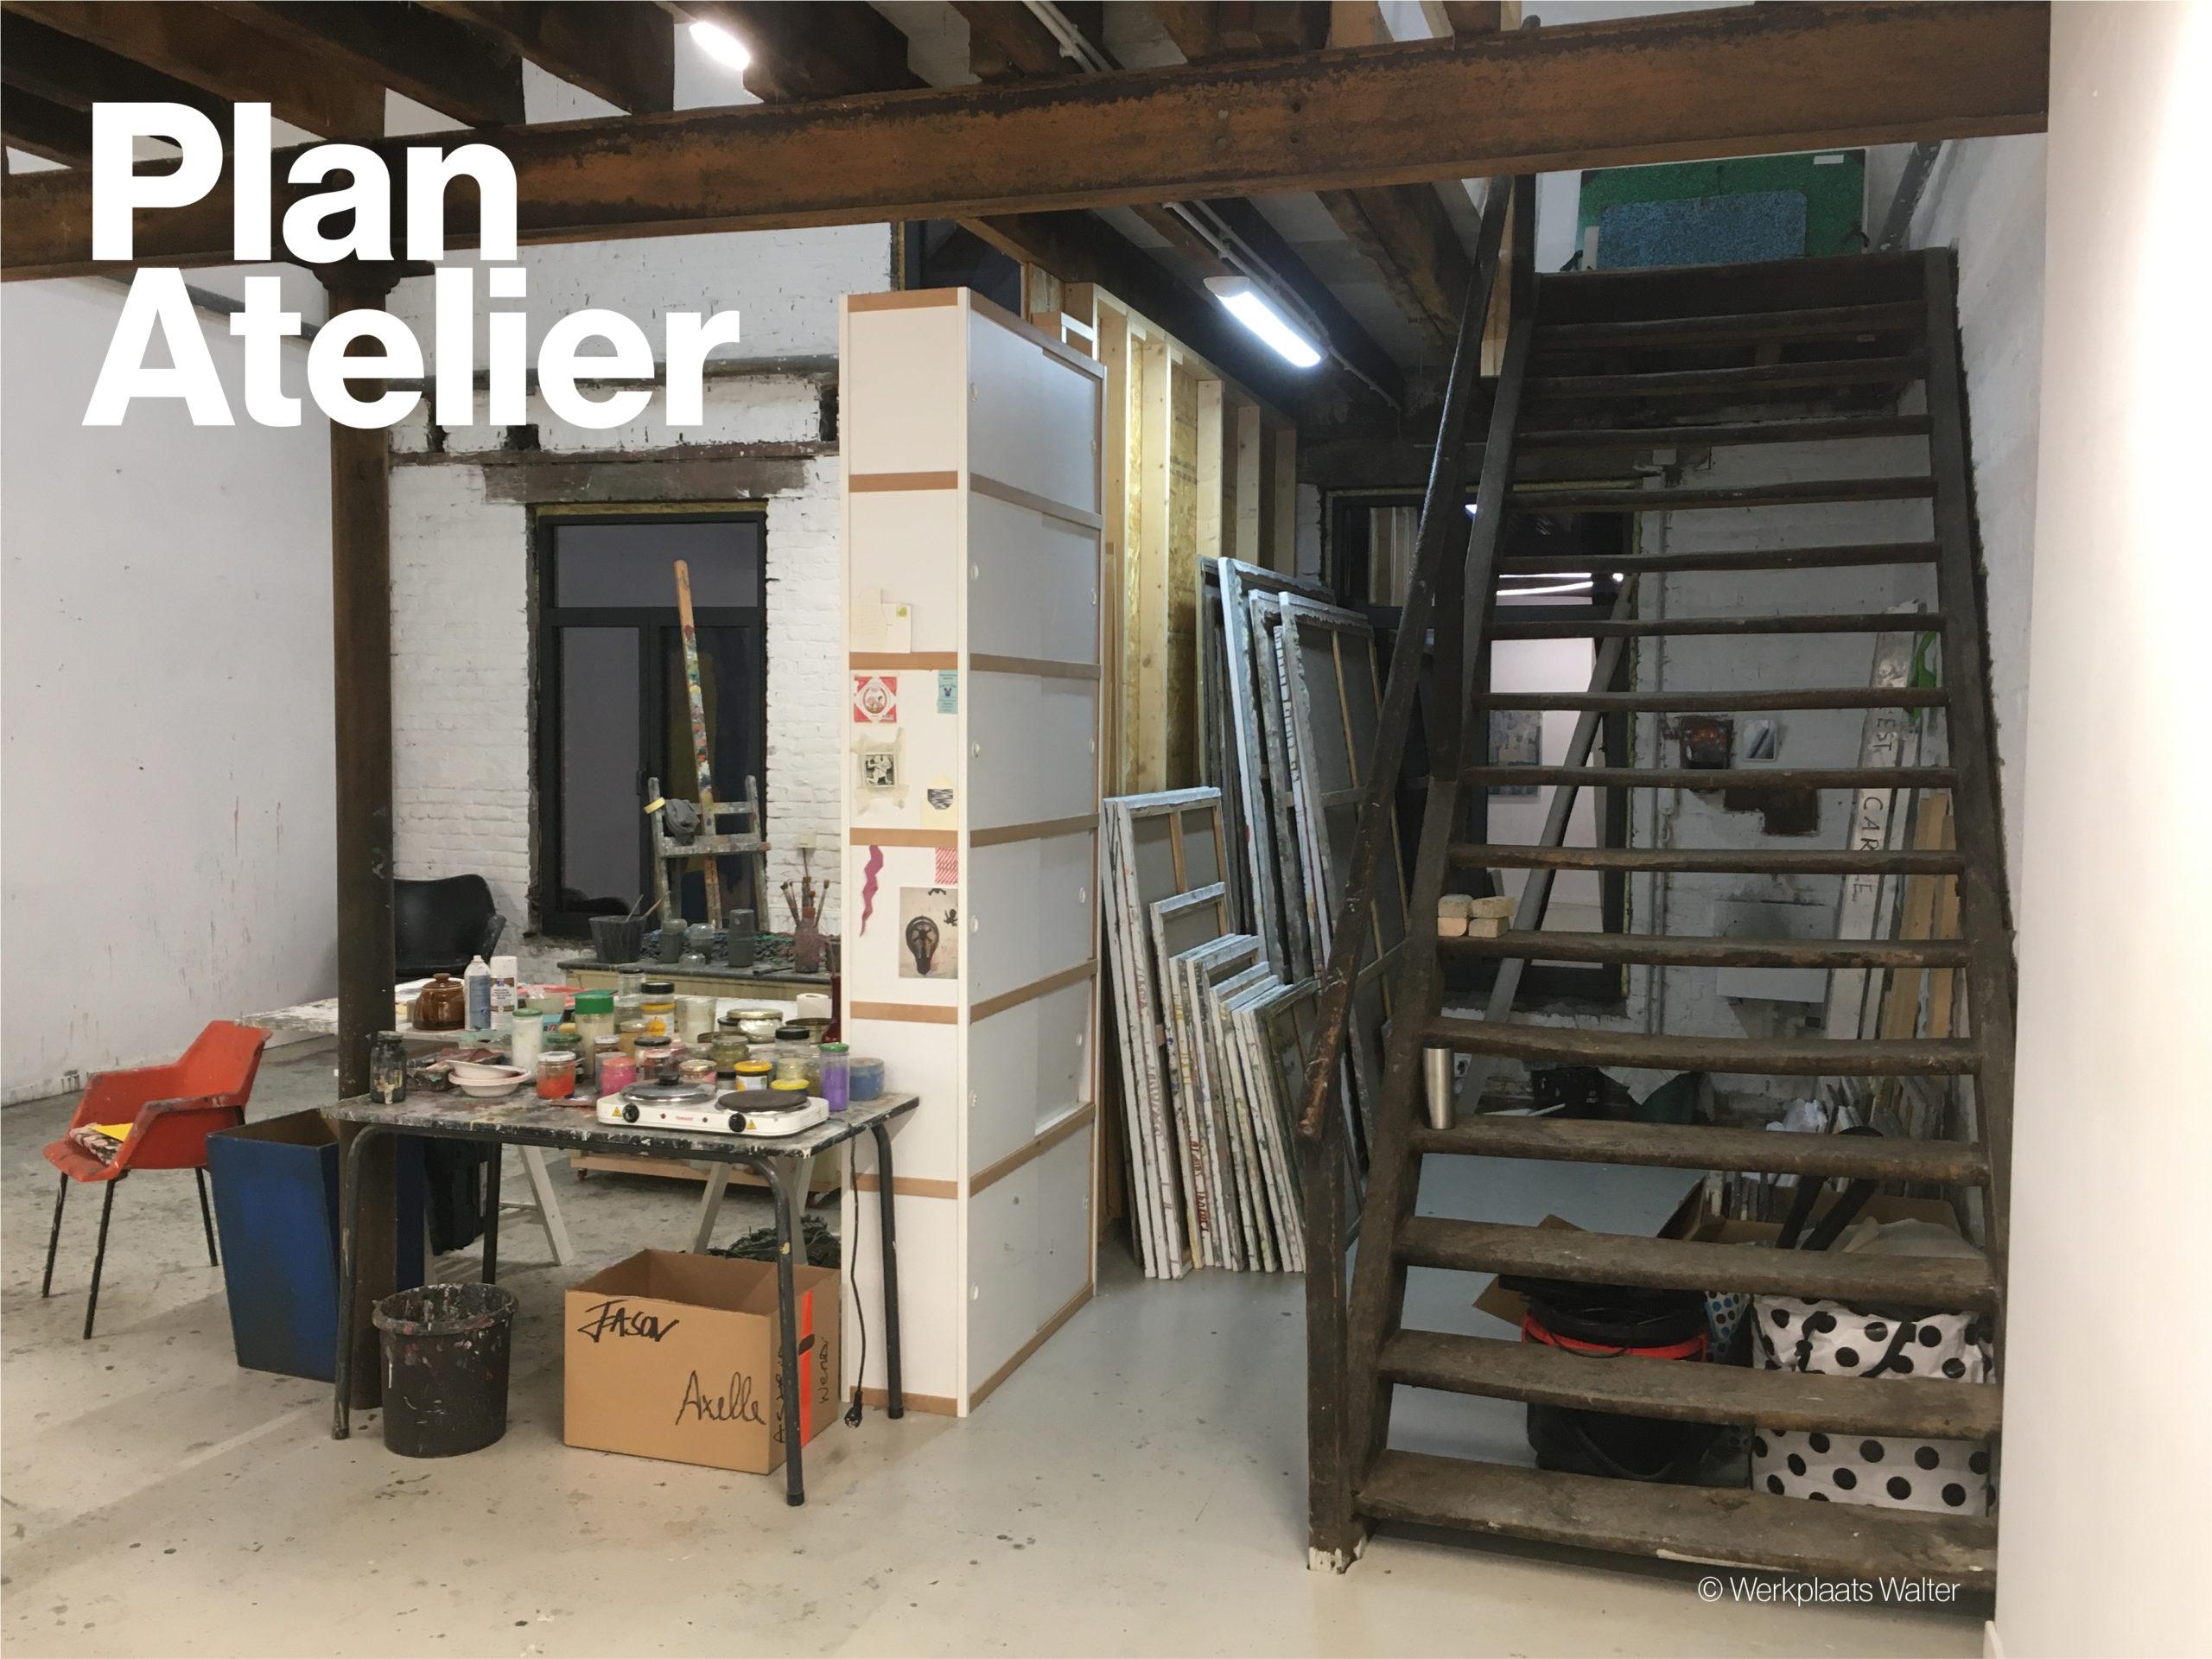 PlanAtelier (c) Werkplaats Walter